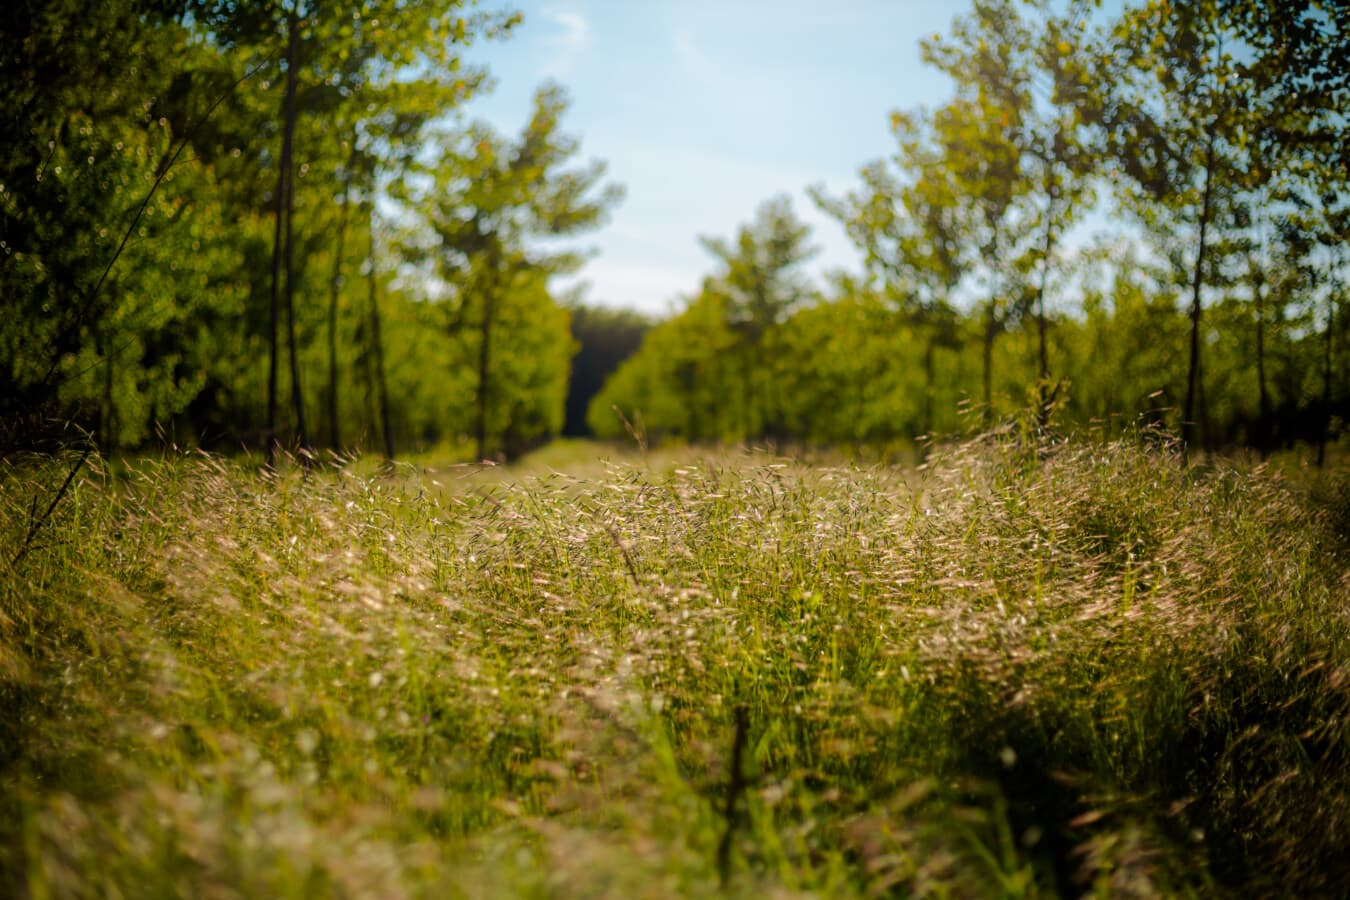 grass, high, grassy, forest, landscape, plant, tree, nature, leaf, fair weather